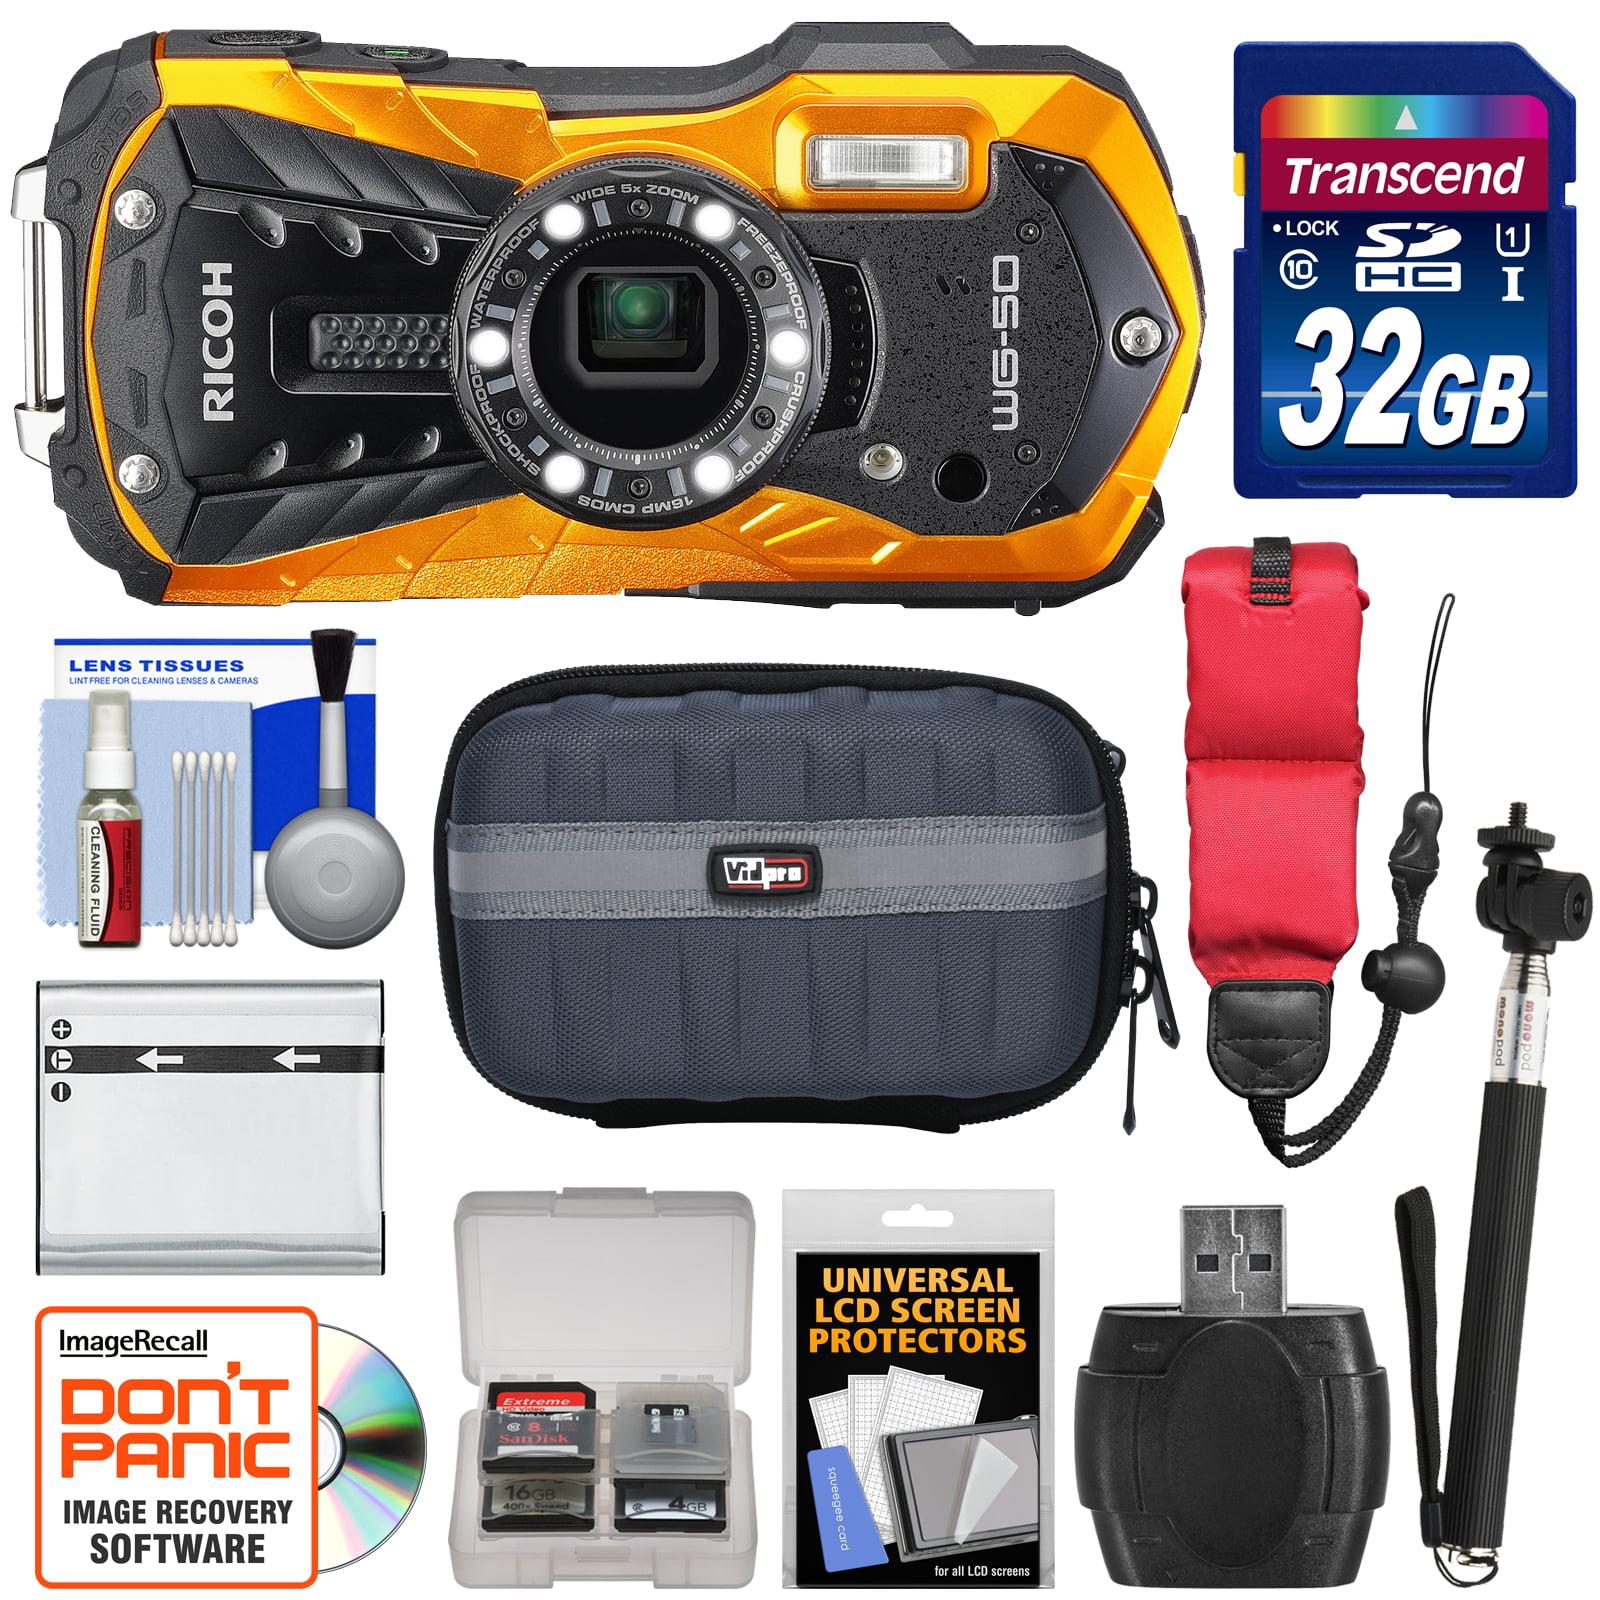 Ricoh WG-50 Waterproof / Shockproof Digital Camera (Orange) with 32GB Card + Battery + Case + Selfie Stick + Strap + Kit